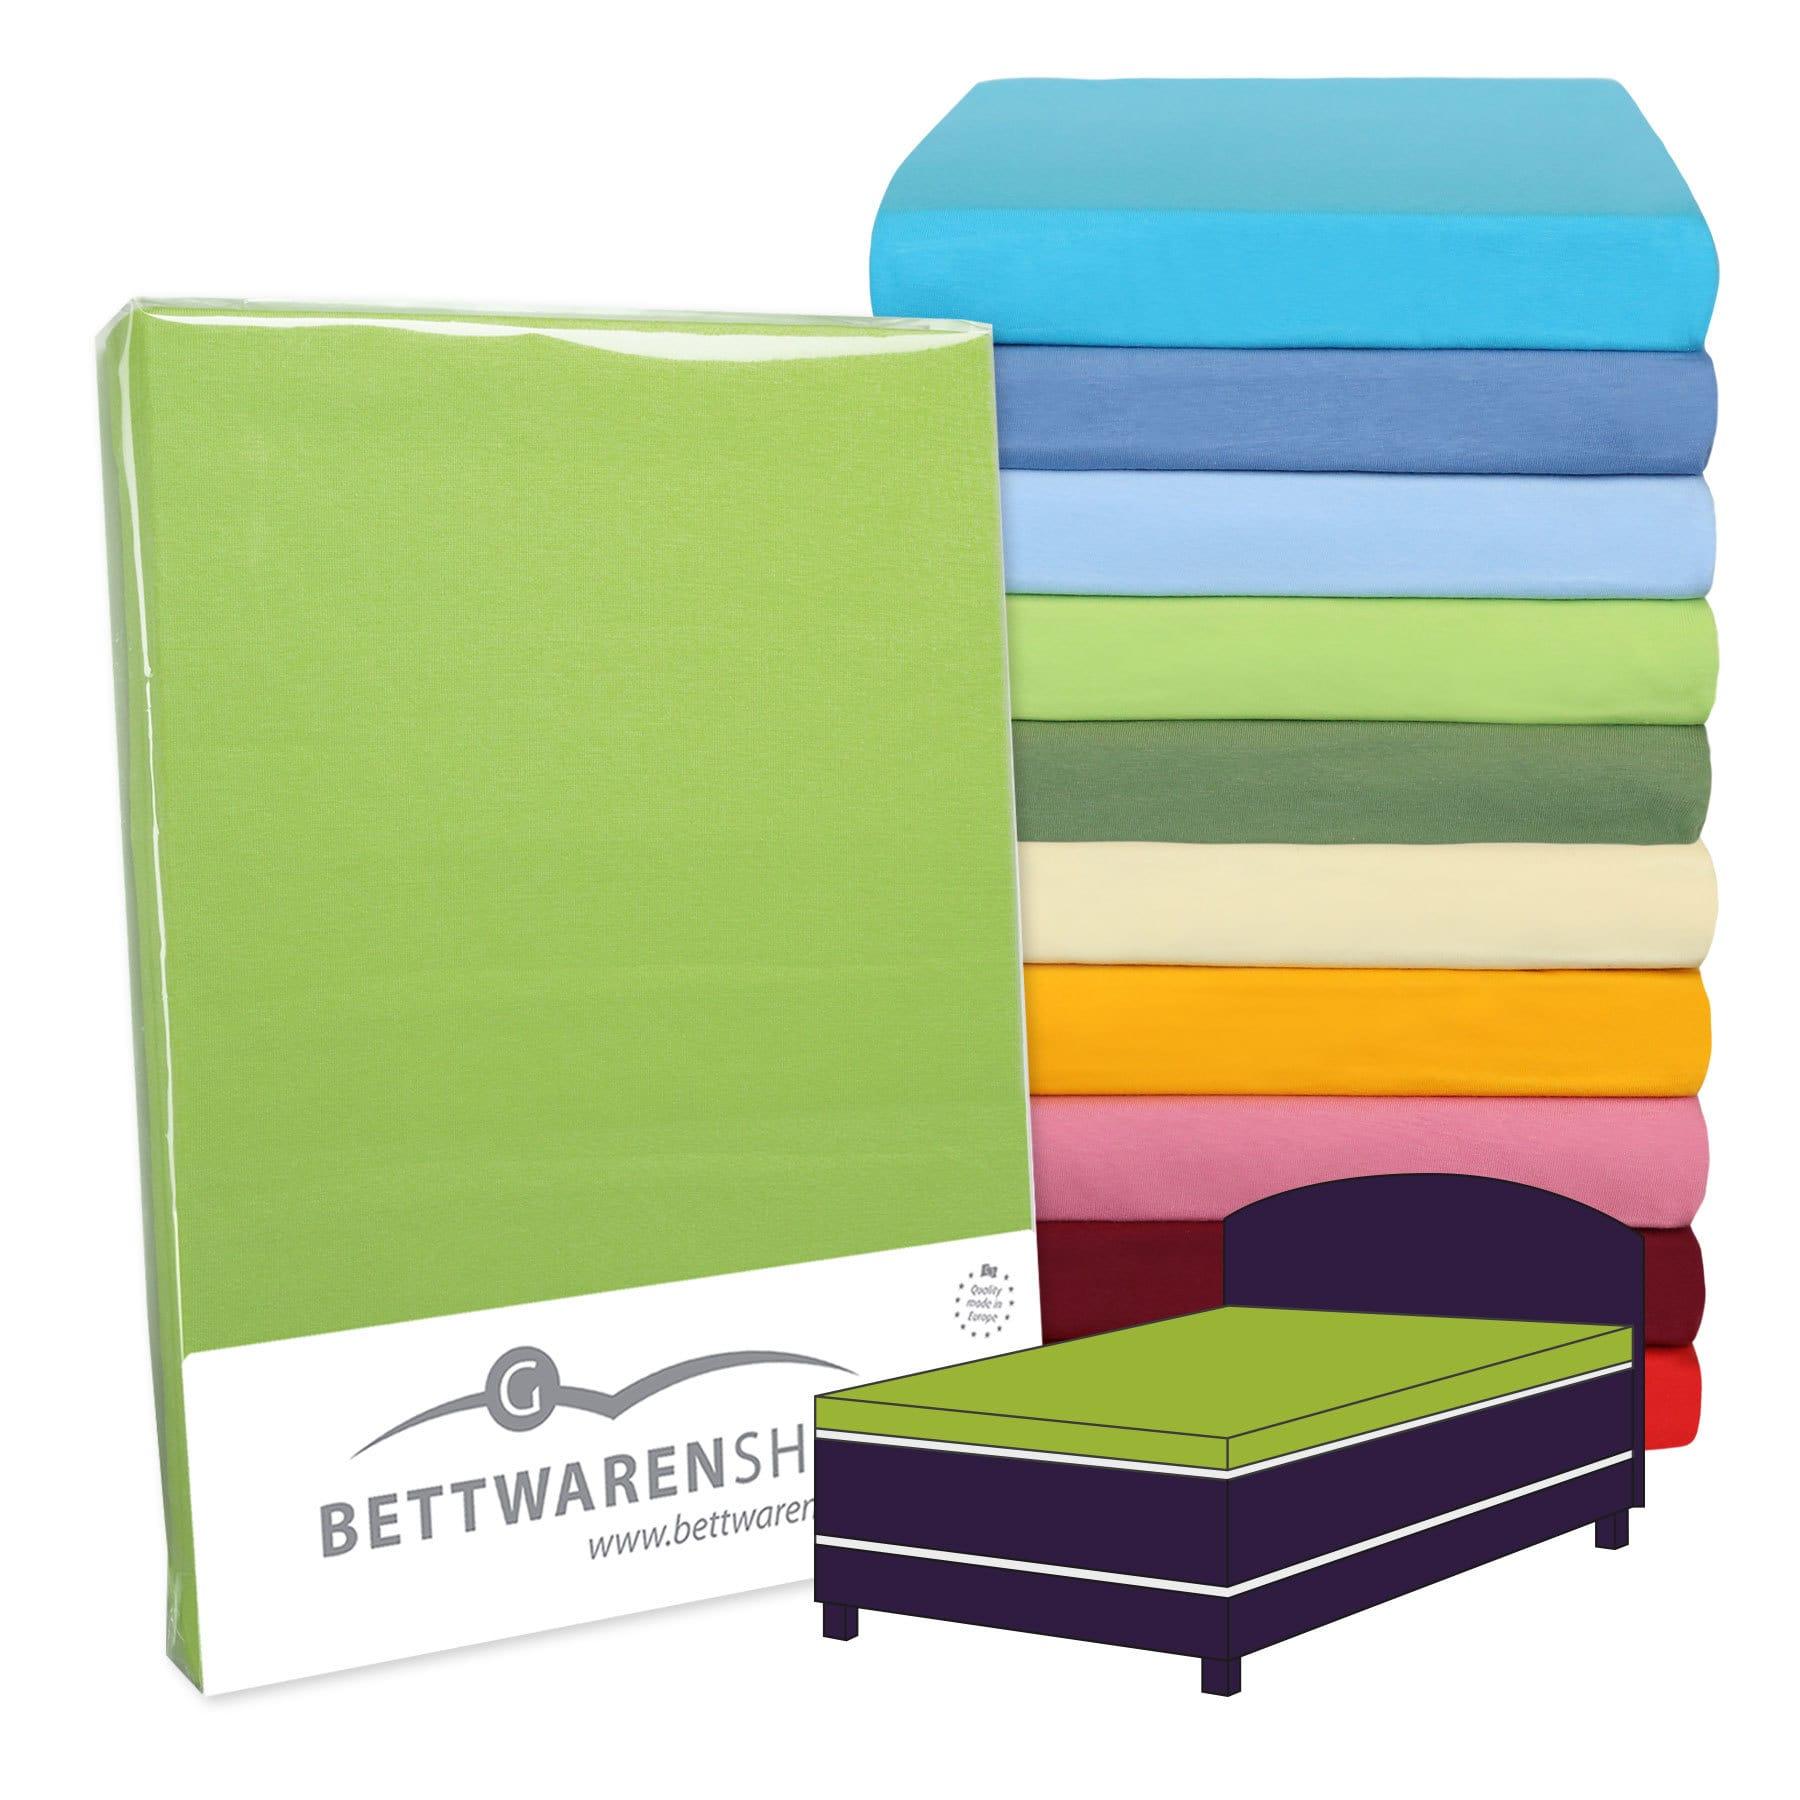 bettwarenshop boxspring topper spannbettlaken hausmarke g nstig online kaufen bei bettwaren shop. Black Bedroom Furniture Sets. Home Design Ideas